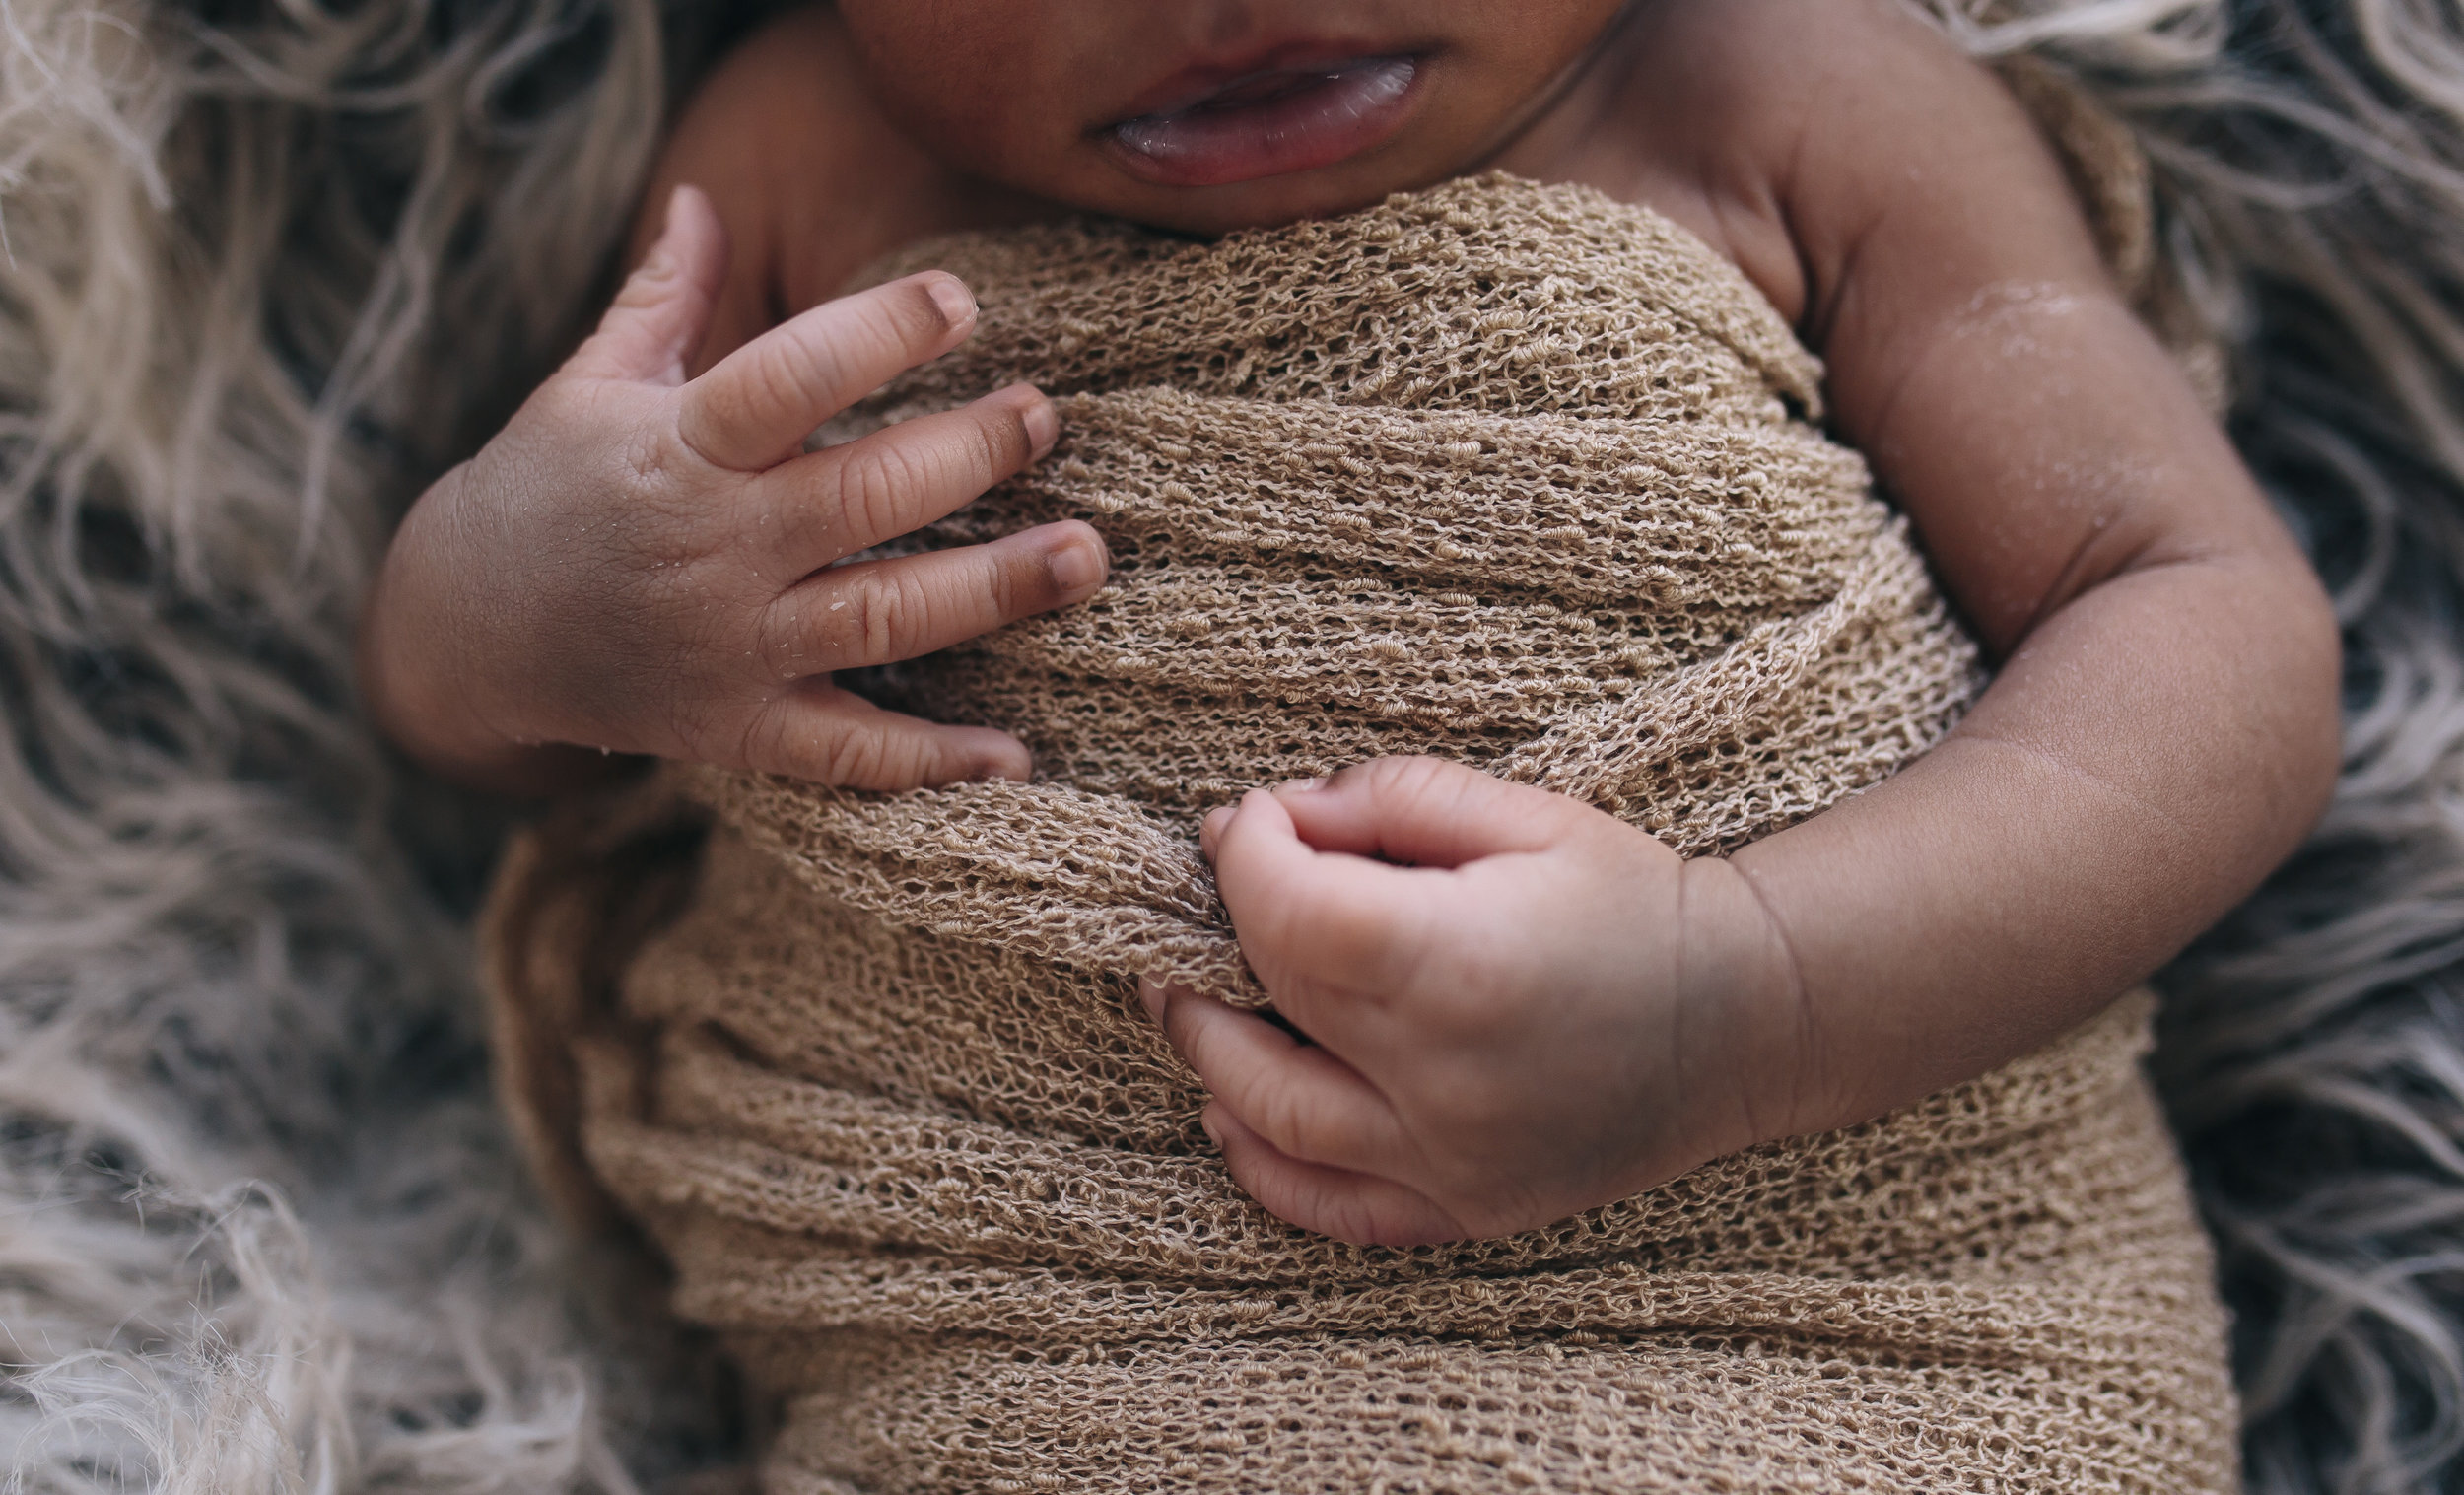 Hanner_Studios_Maternity_Photos_Newborn_Photography_Doulas_of_Raleigh_NC_7248.jpg